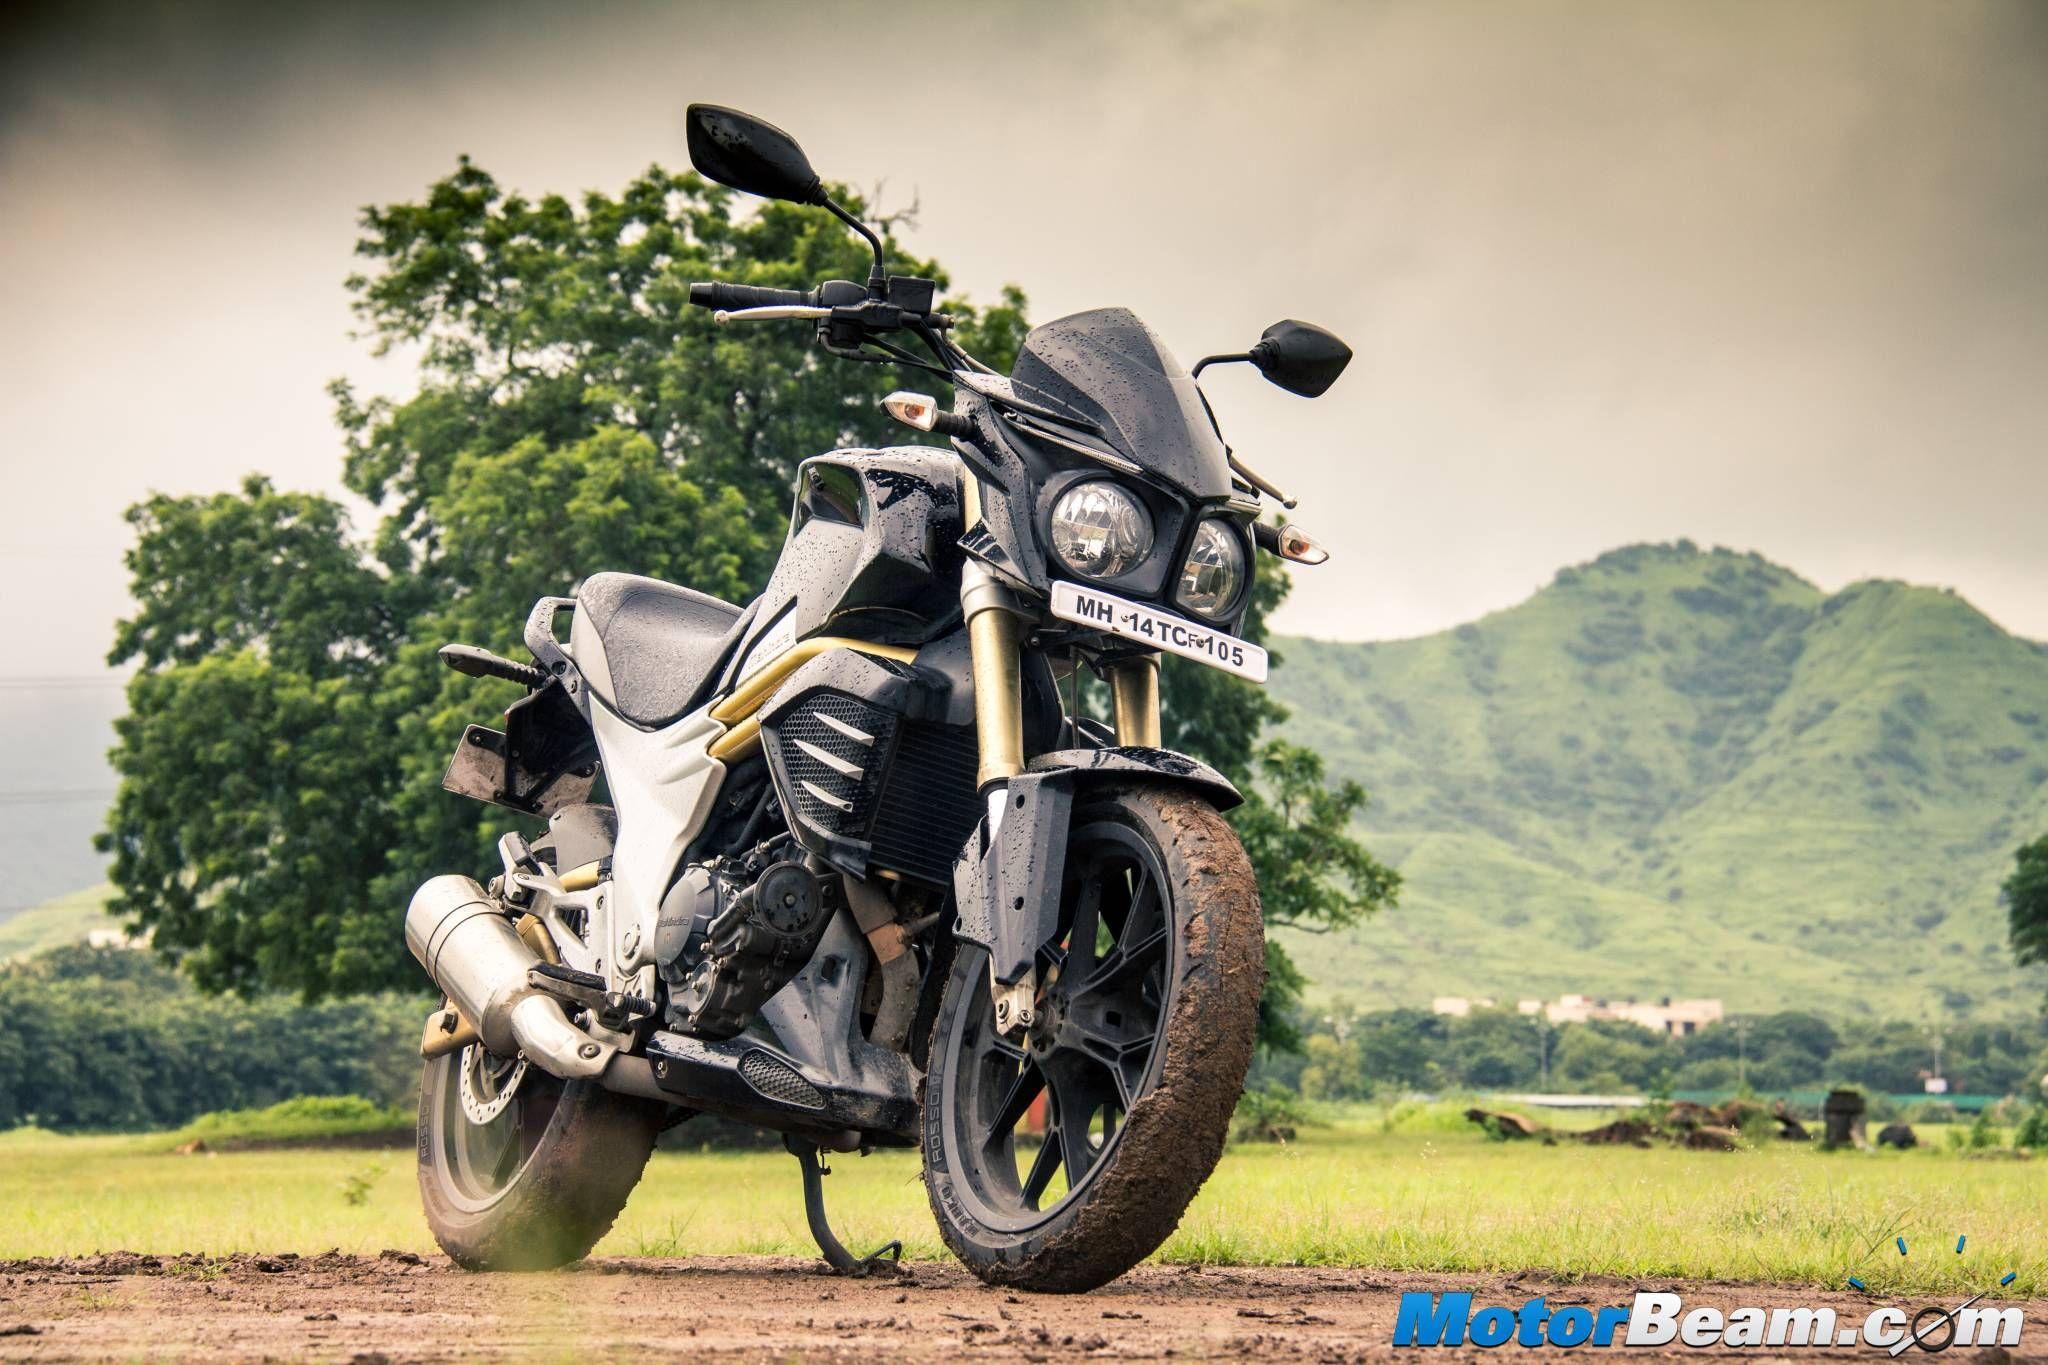 2015 Mahindra Mojo First Ride Review Bike reviews, New